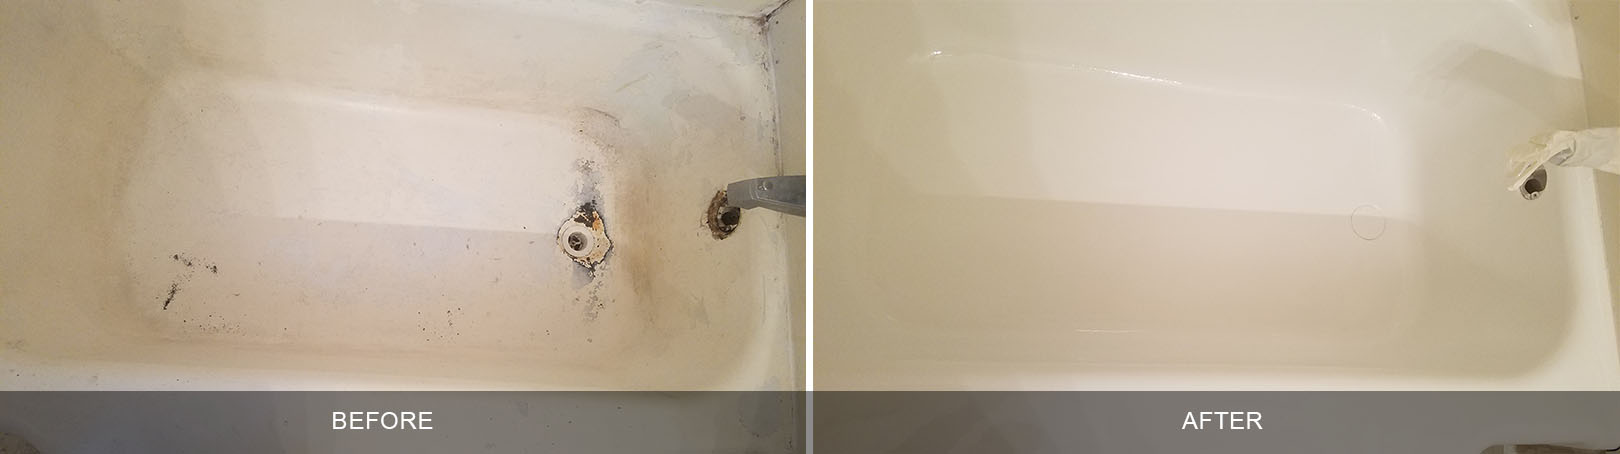 Gallery Fort Wayne Bathtub Refinishing Bathtub Resurfacing And - Bathroom remodeling fort wayne indiana